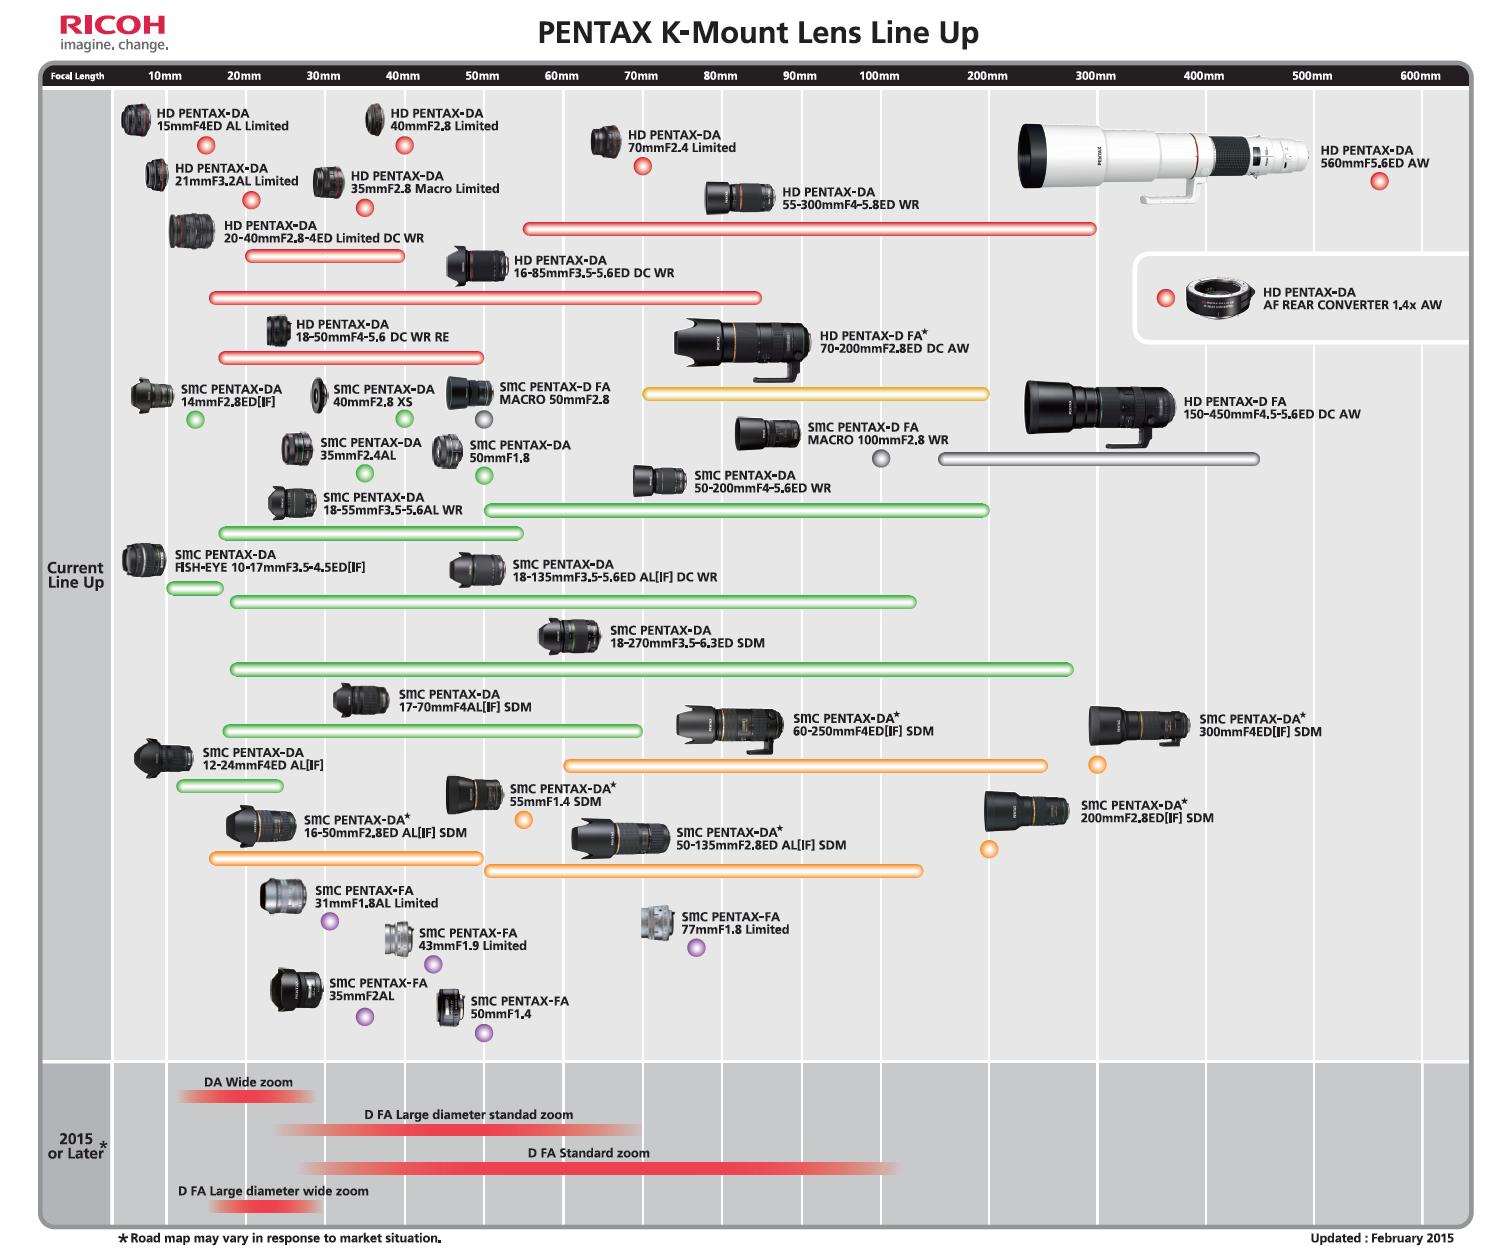 Ricoh's newest lens roadmaps show four upcoming K-mount lenses